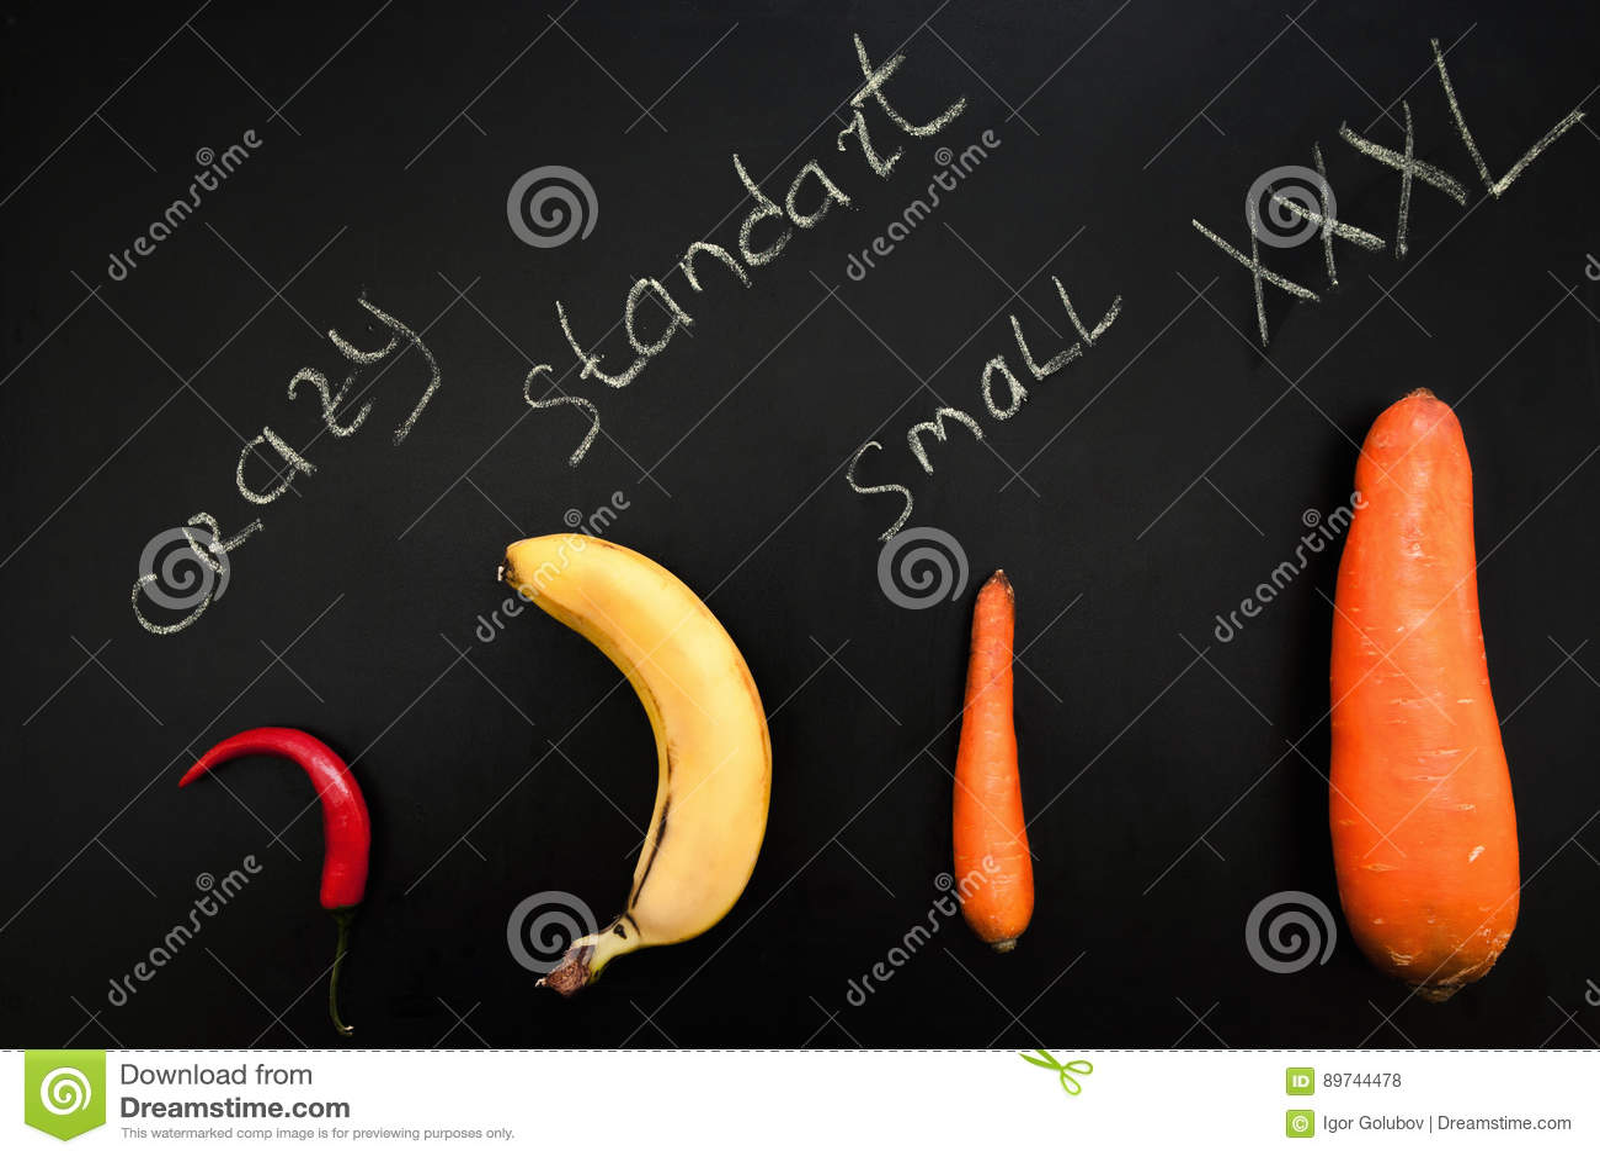 verdure simili a pene